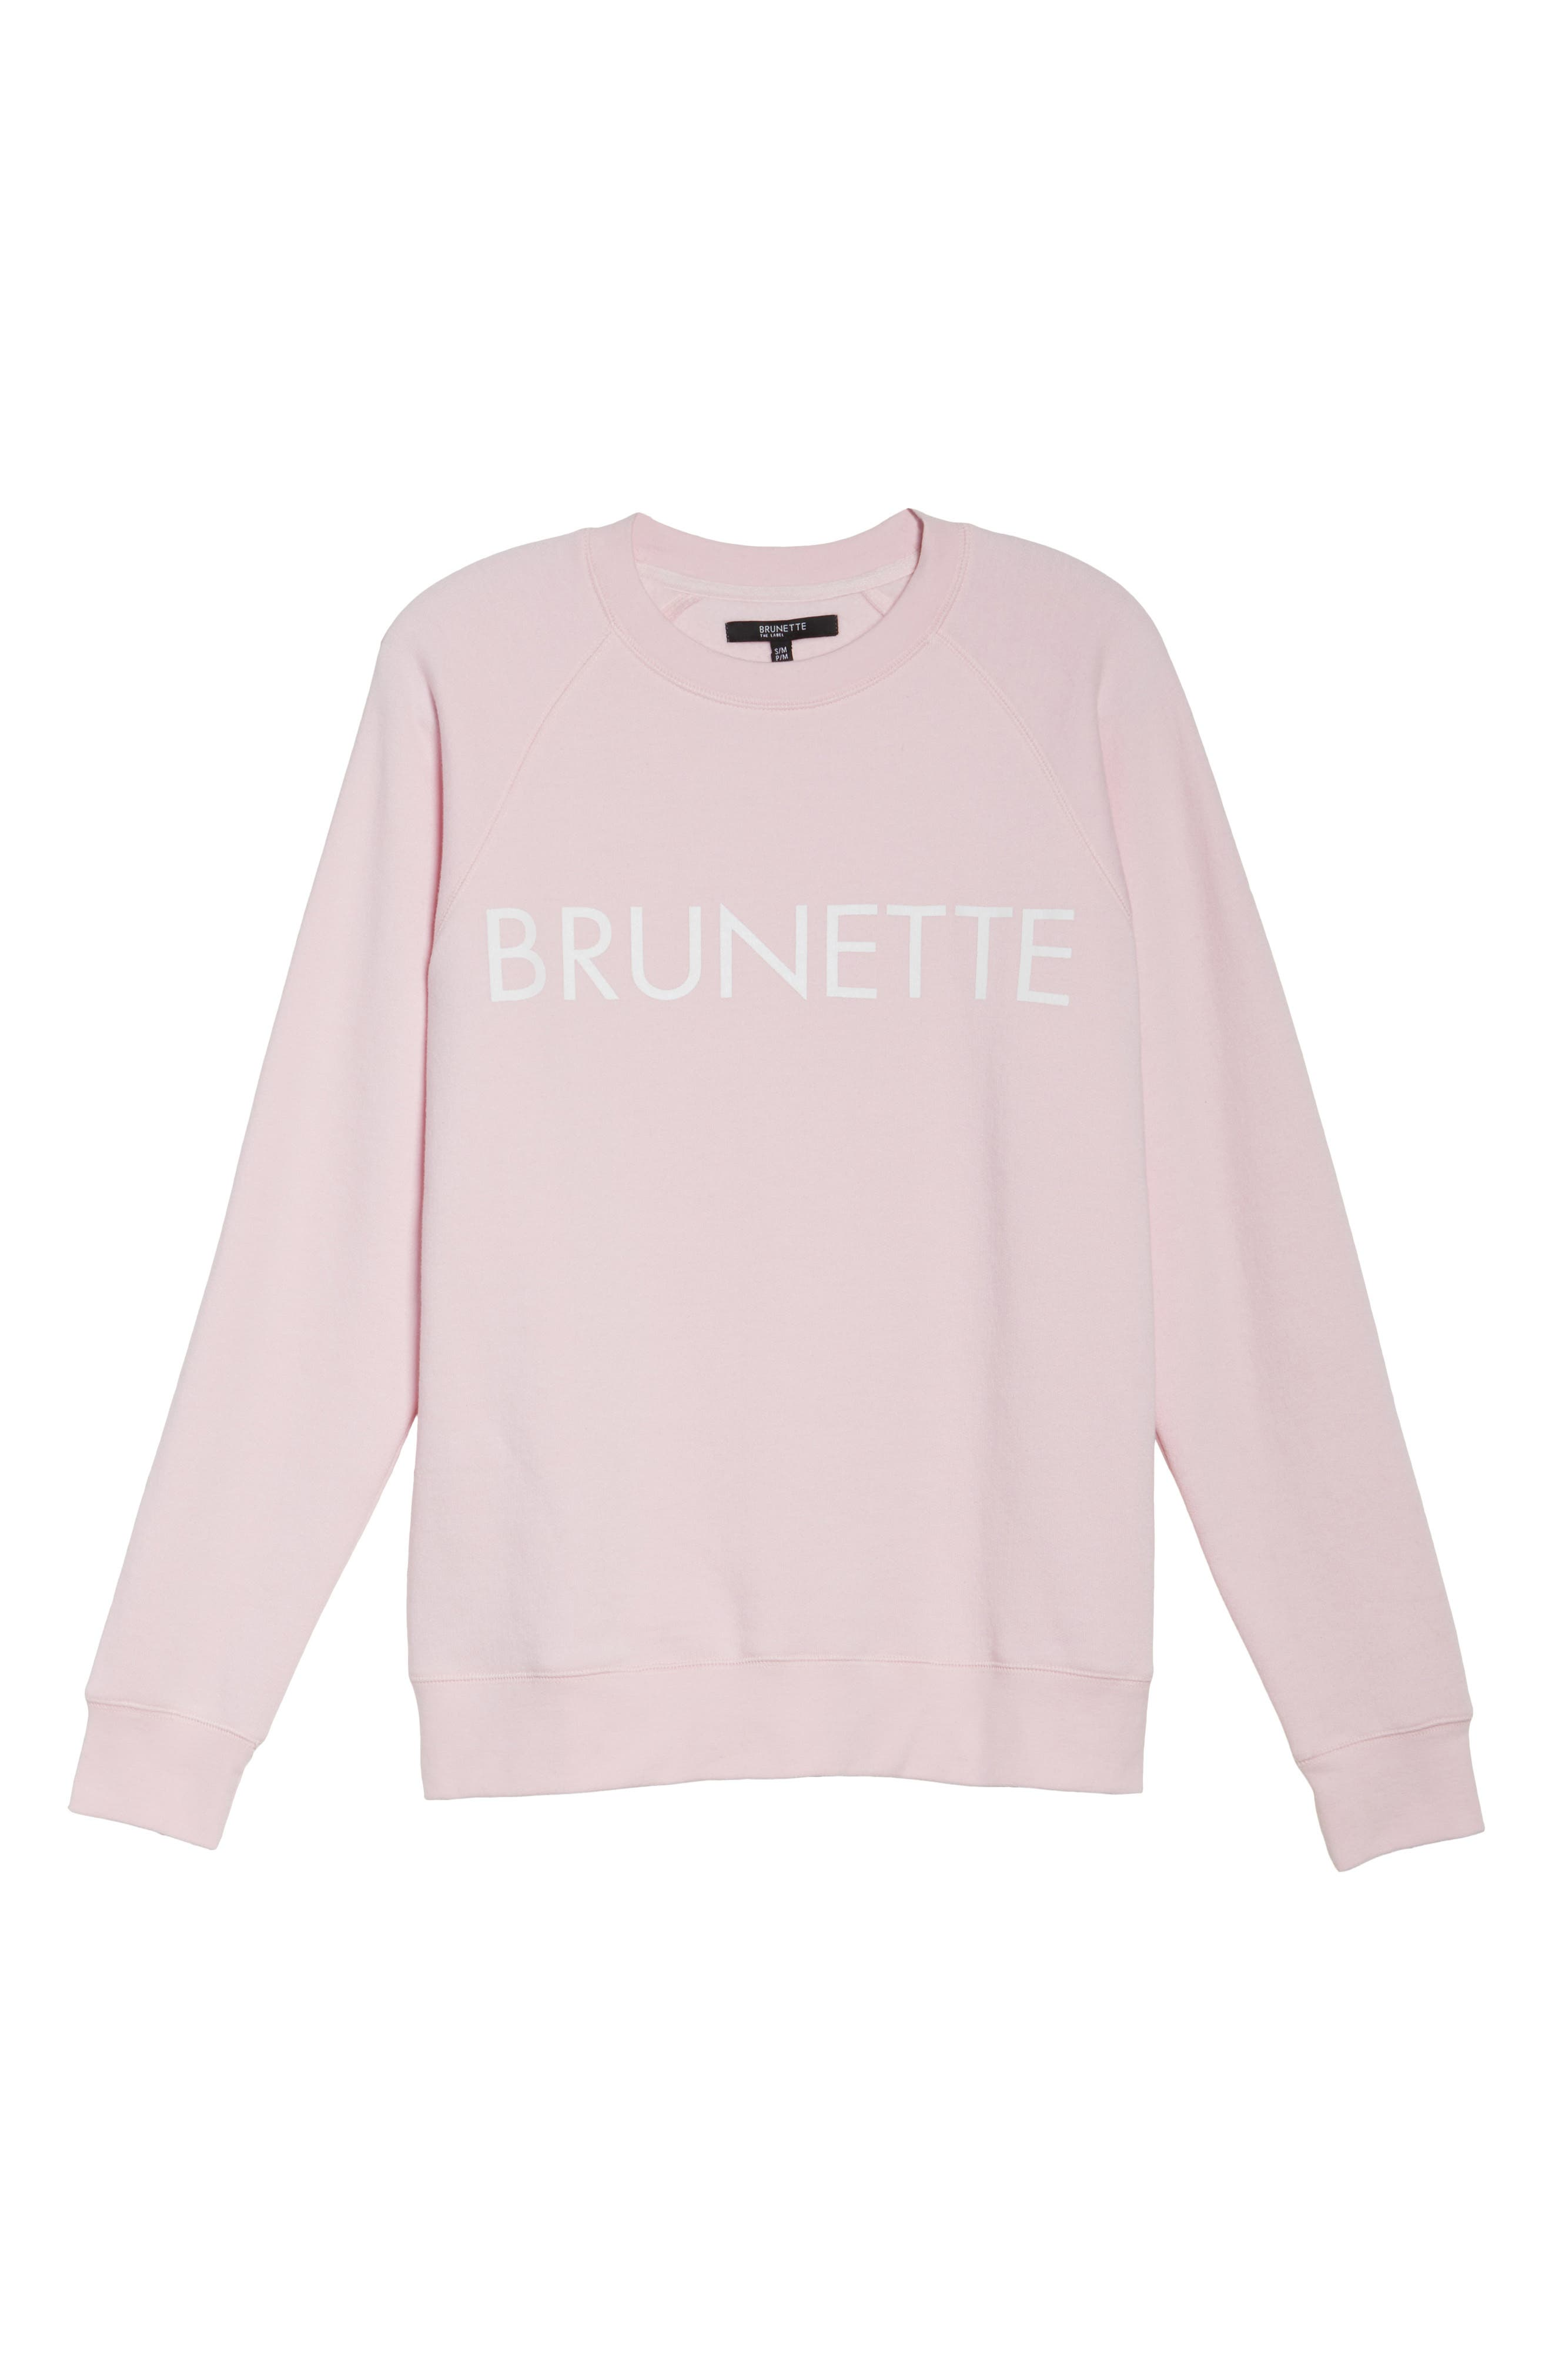 Brunette Crewneck Sweatshirt,                             Alternate thumbnail 4, color,                             Pink